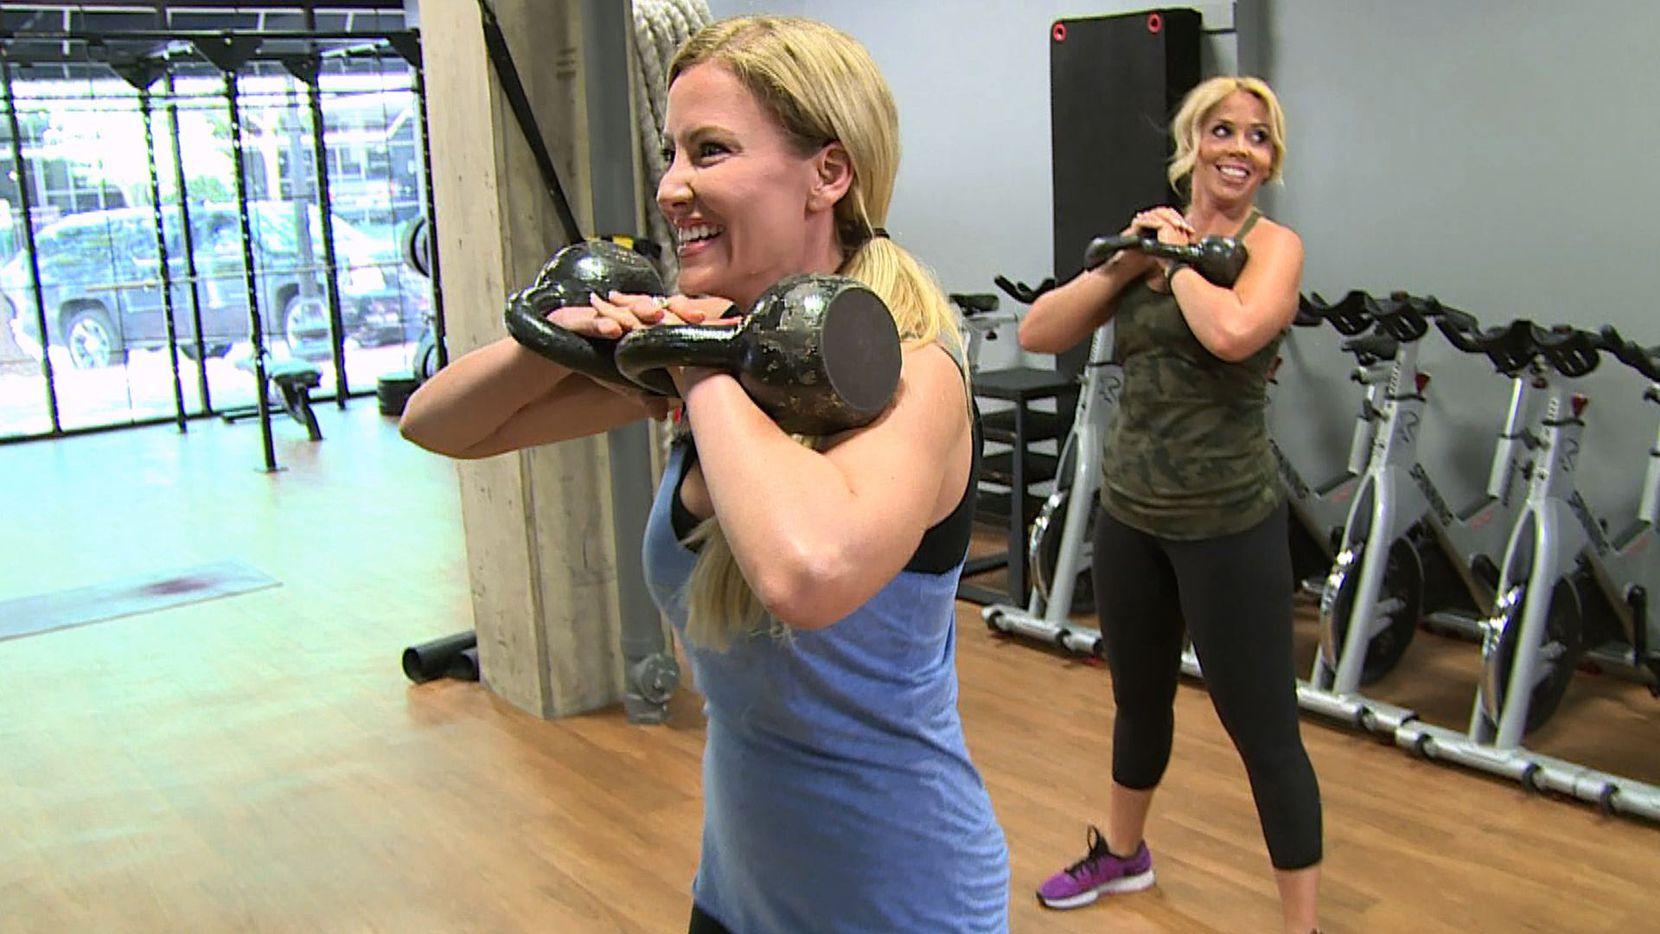 Stephanie Hollman, left, teaches writer Kimber Westphall how to do squats holding kettlebells.